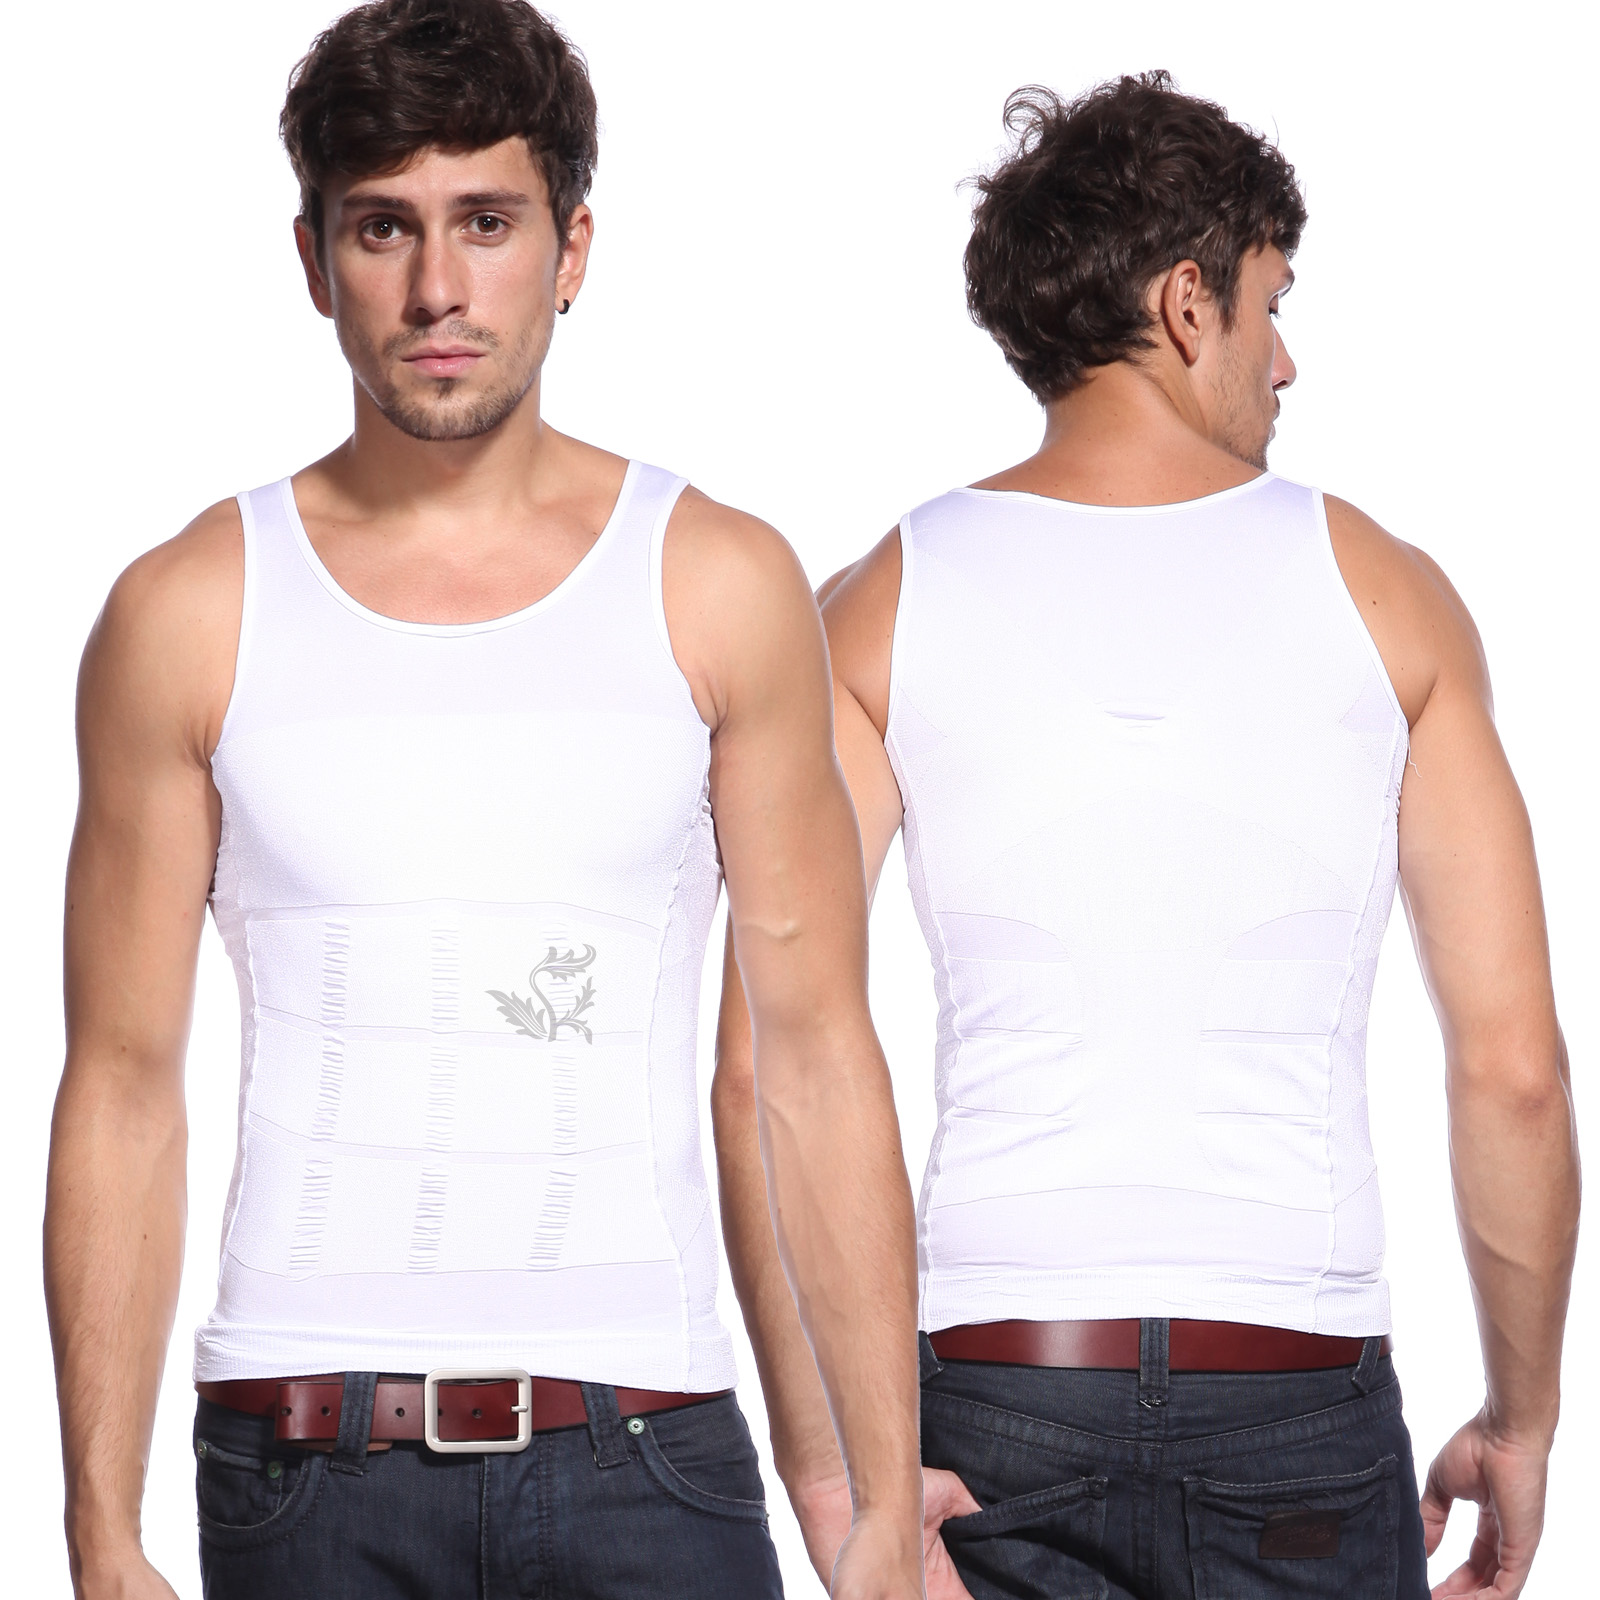 gaine d bardeur homme slim ventre plat veste minceur fitness blanc l xl neuf ebay. Black Bedroom Furniture Sets. Home Design Ideas